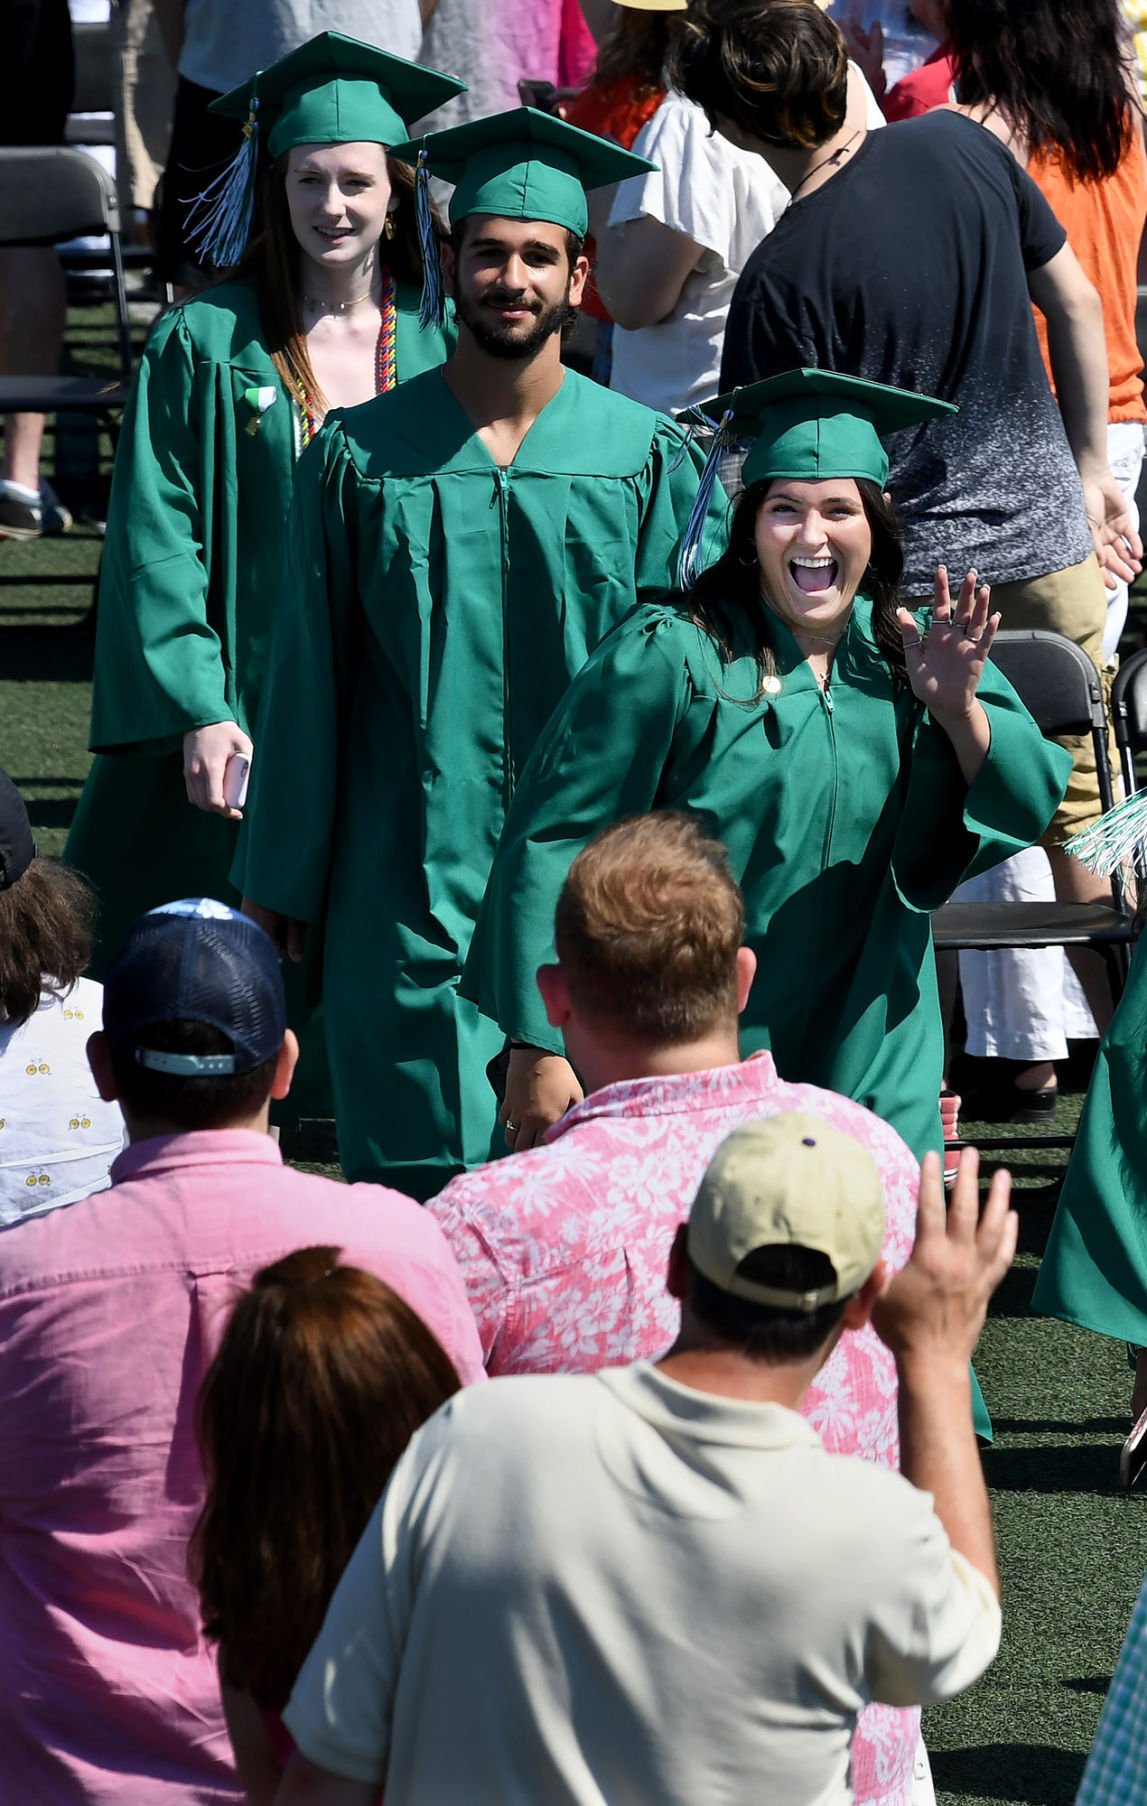 Mansfield HS Graduation 2021